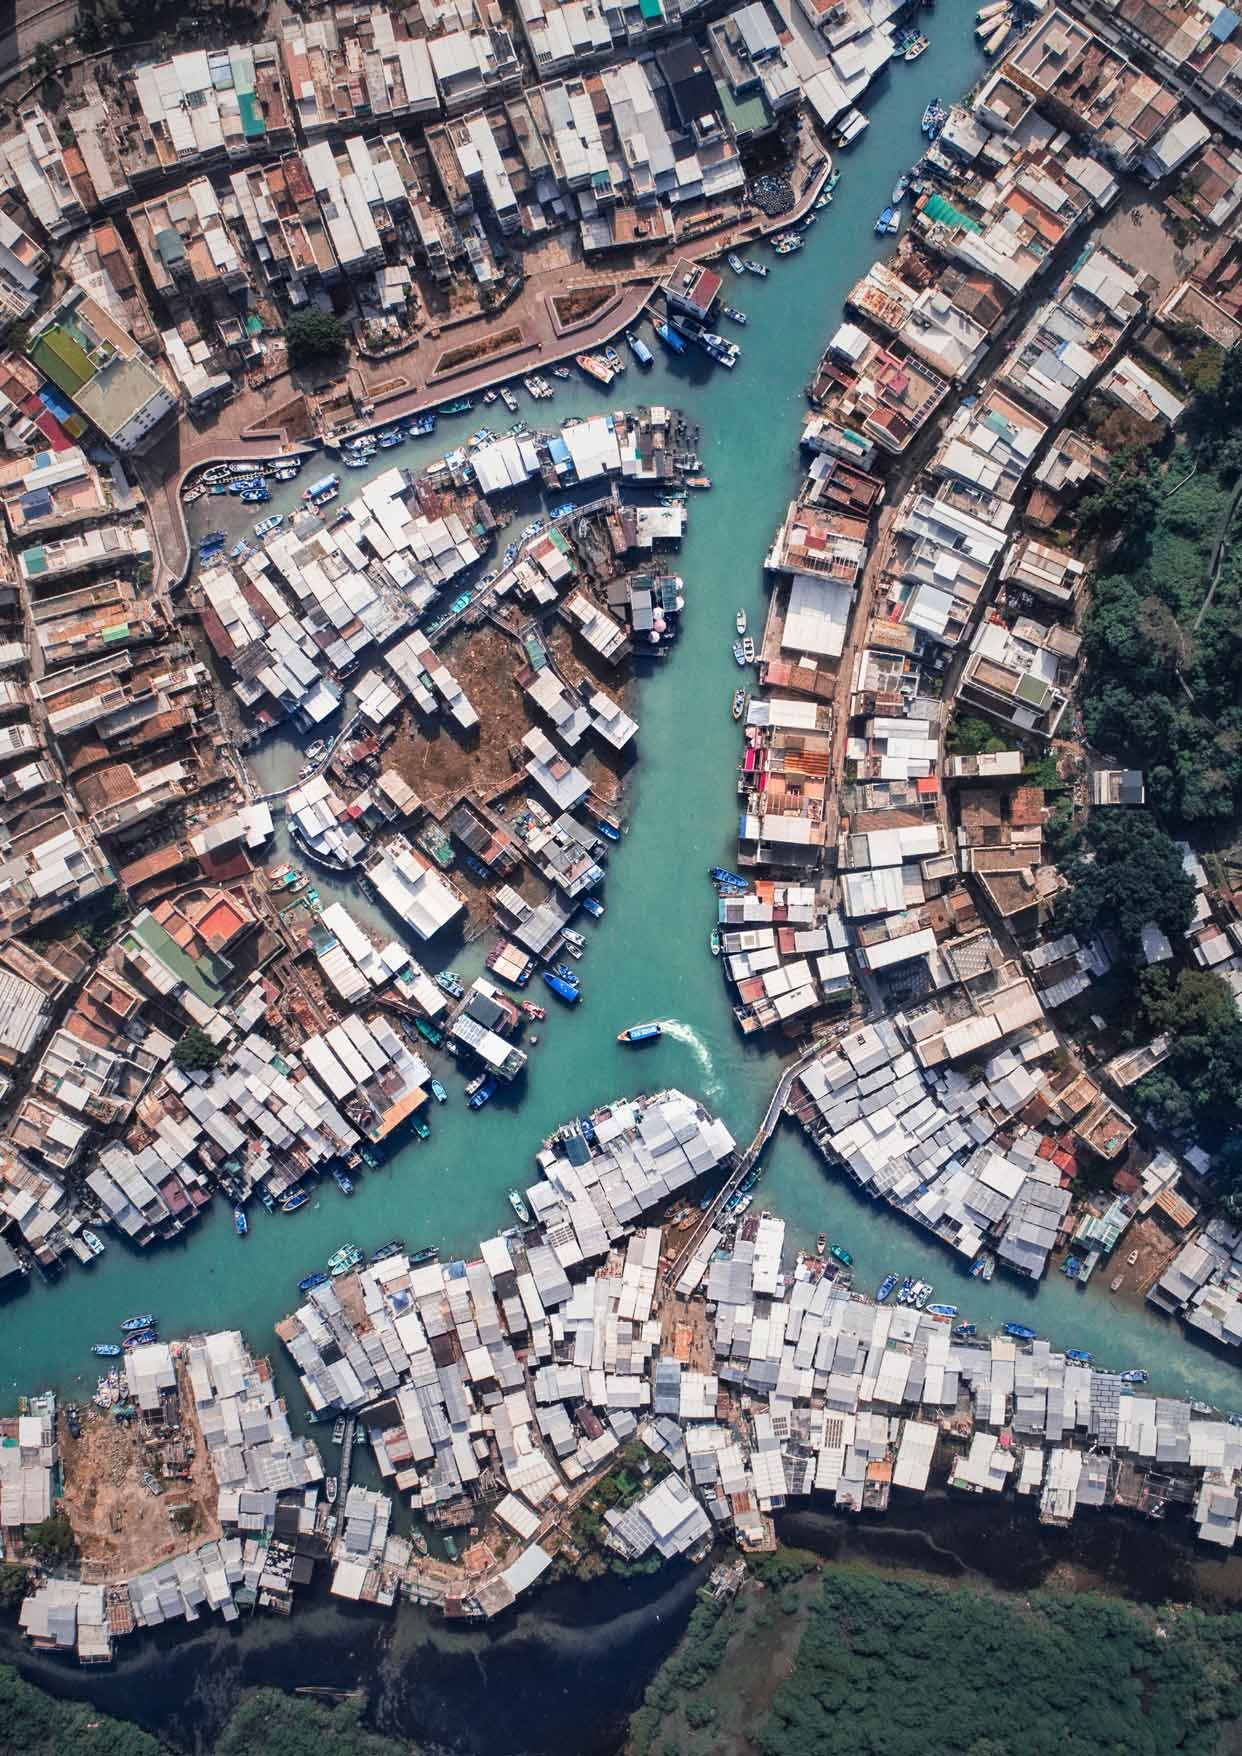 Drone view of Tai-O Fishing Village